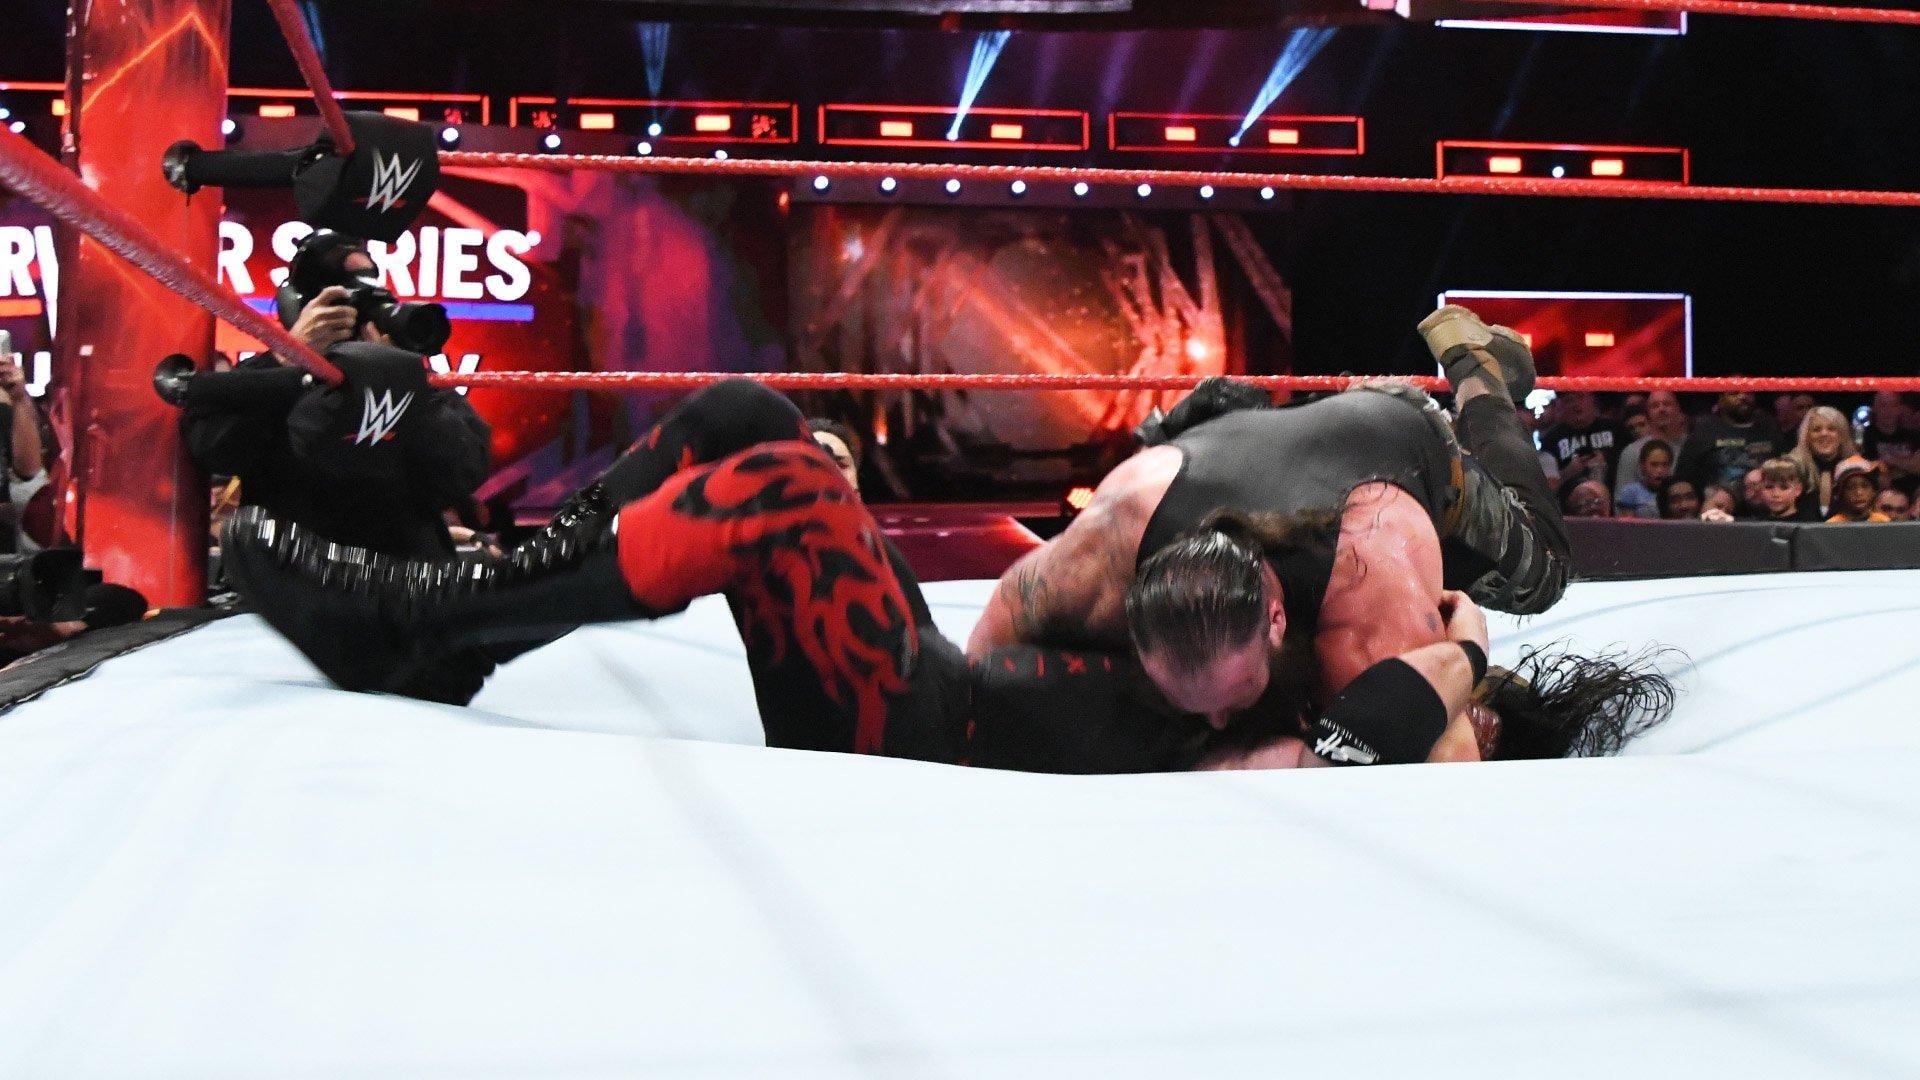 WWE Raw - Season 25 Episode 46 : November 13, 2017 (Atlanta, Georgia)